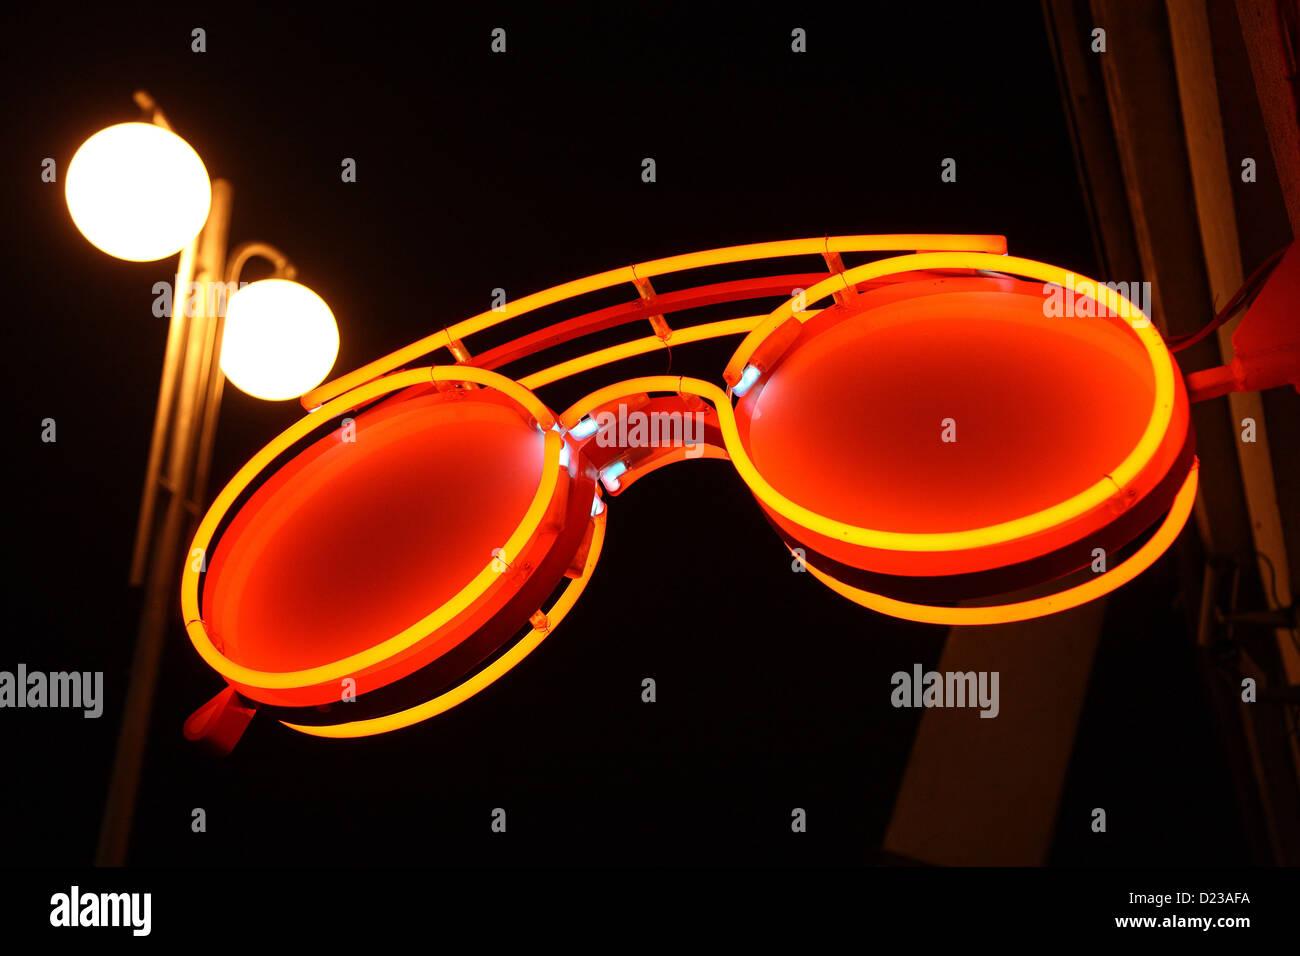 Neon Sign For Optician Stock Photos & Neon Sign For Optician Stock